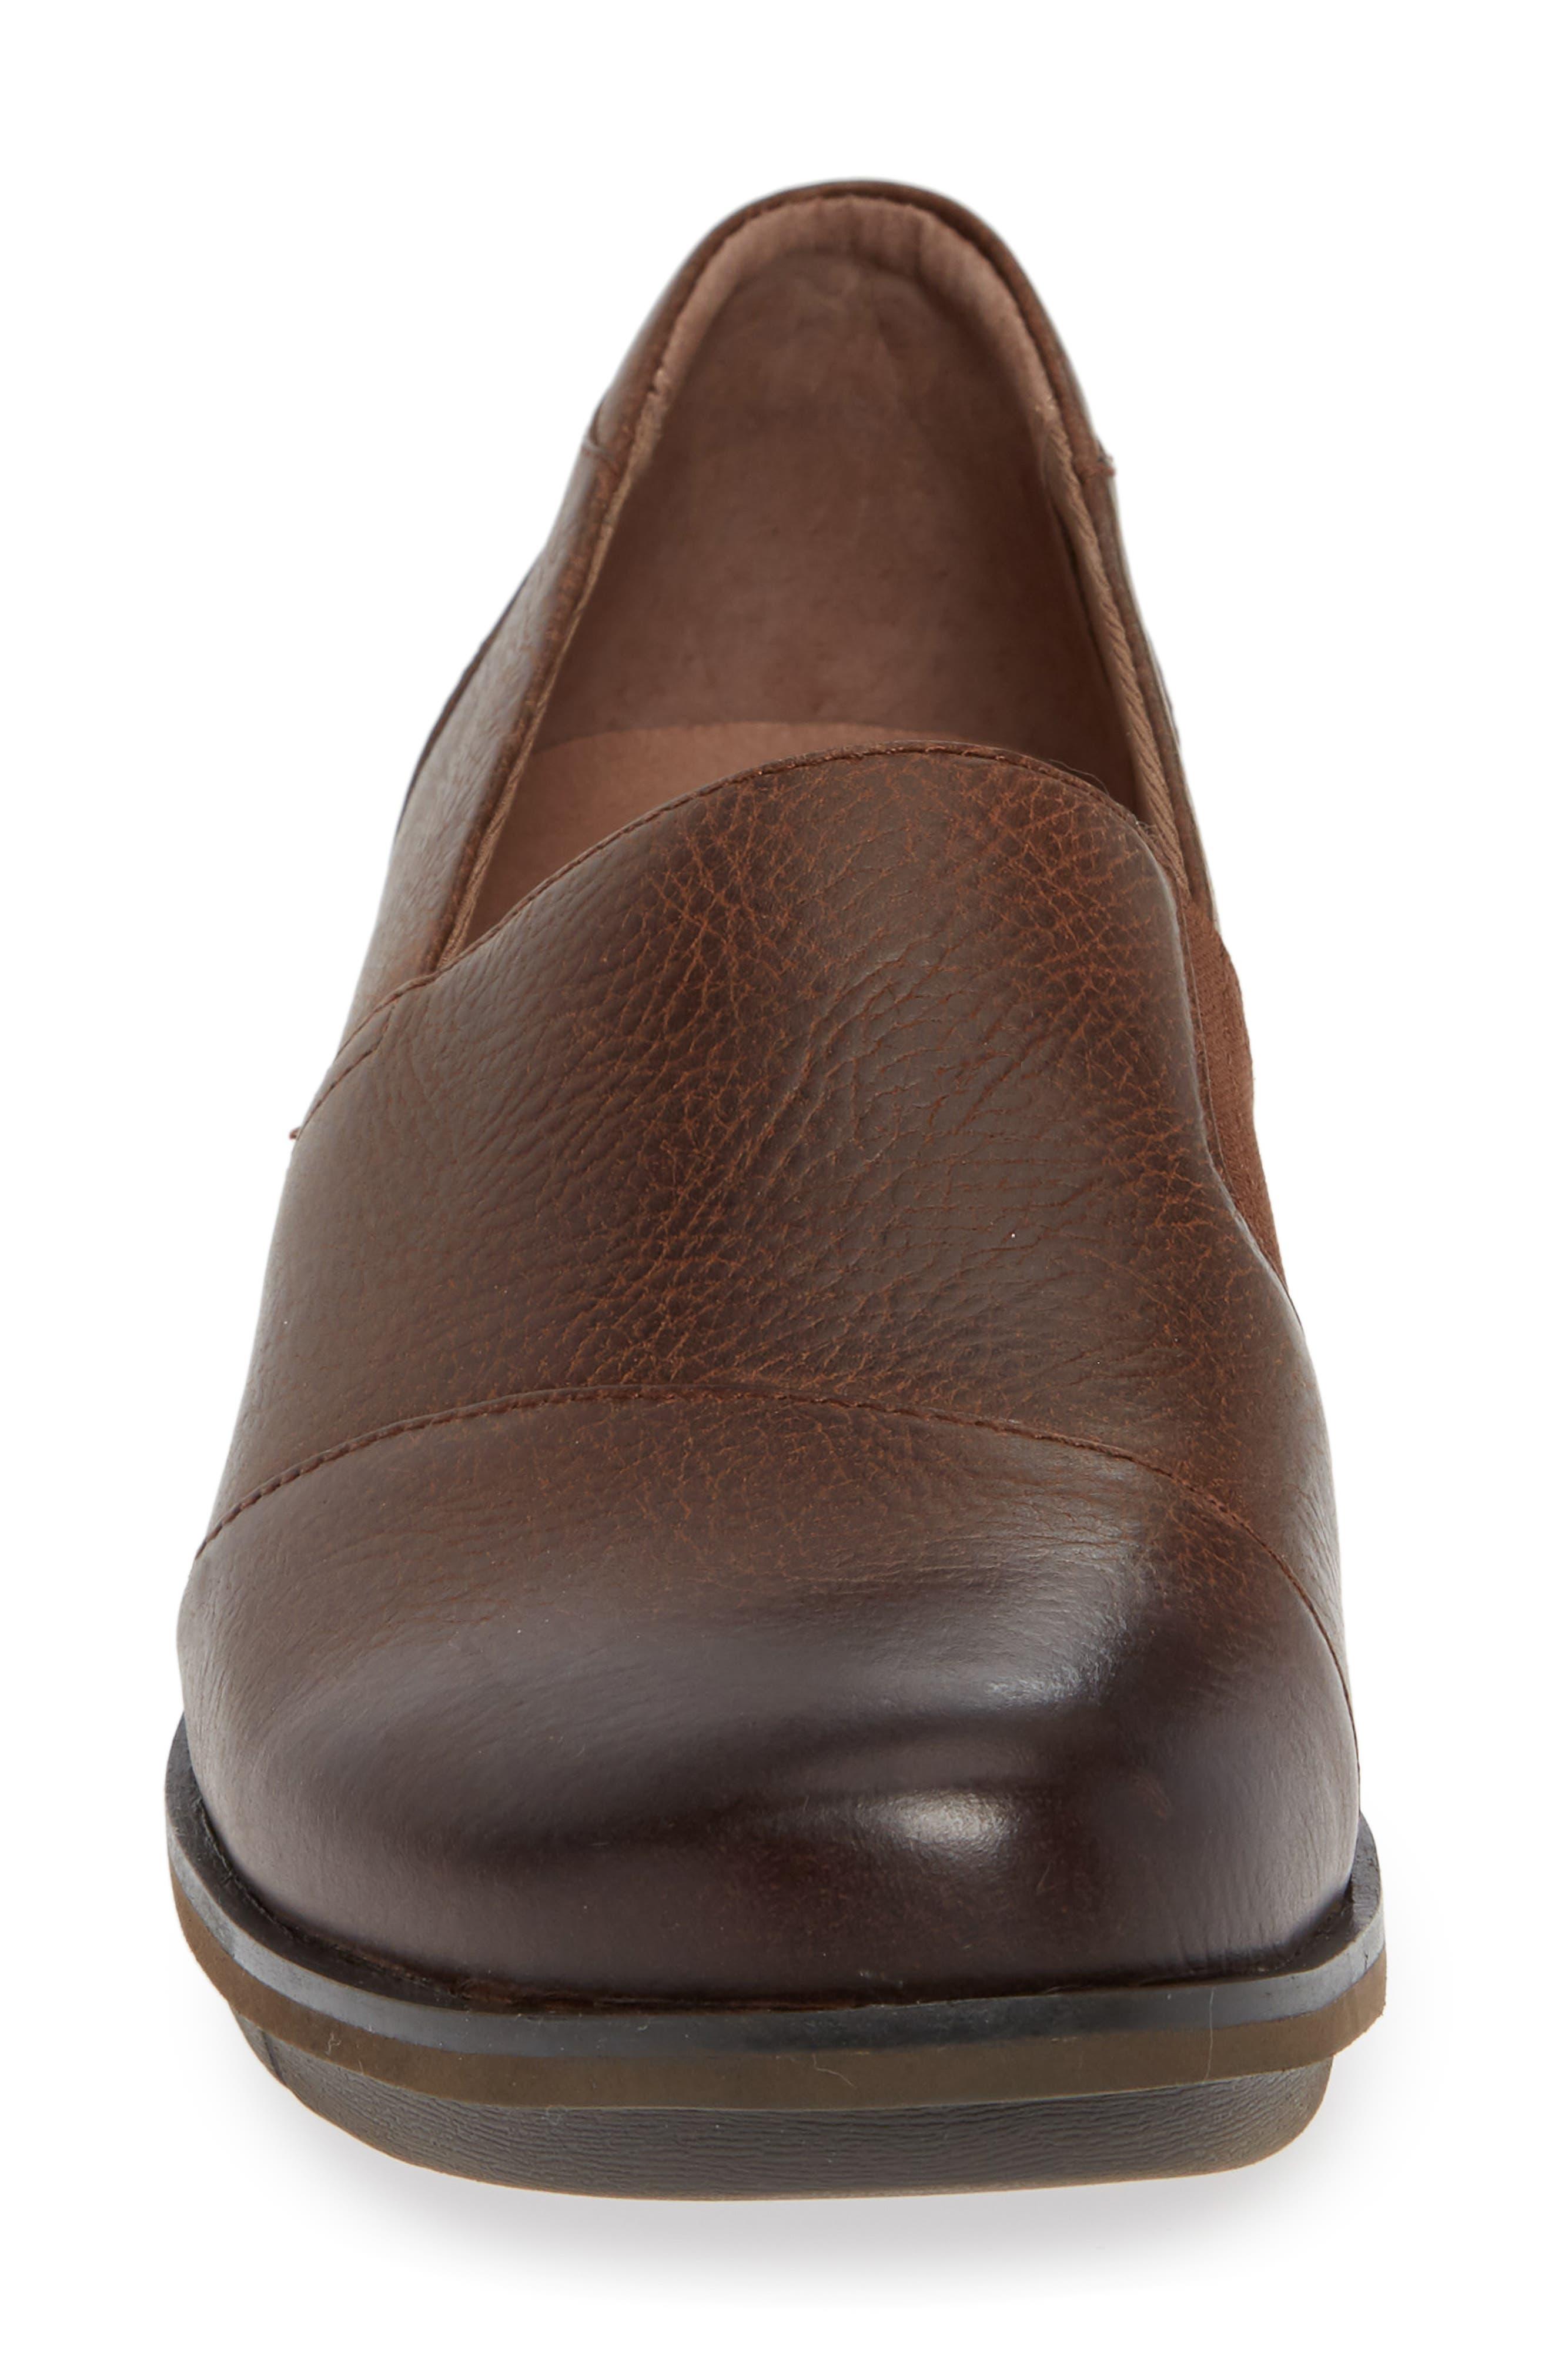 Dankso Julia Wedge Slip-On,                             Alternate thumbnail 3, color,                             Brown Burnished Nubuck Leather